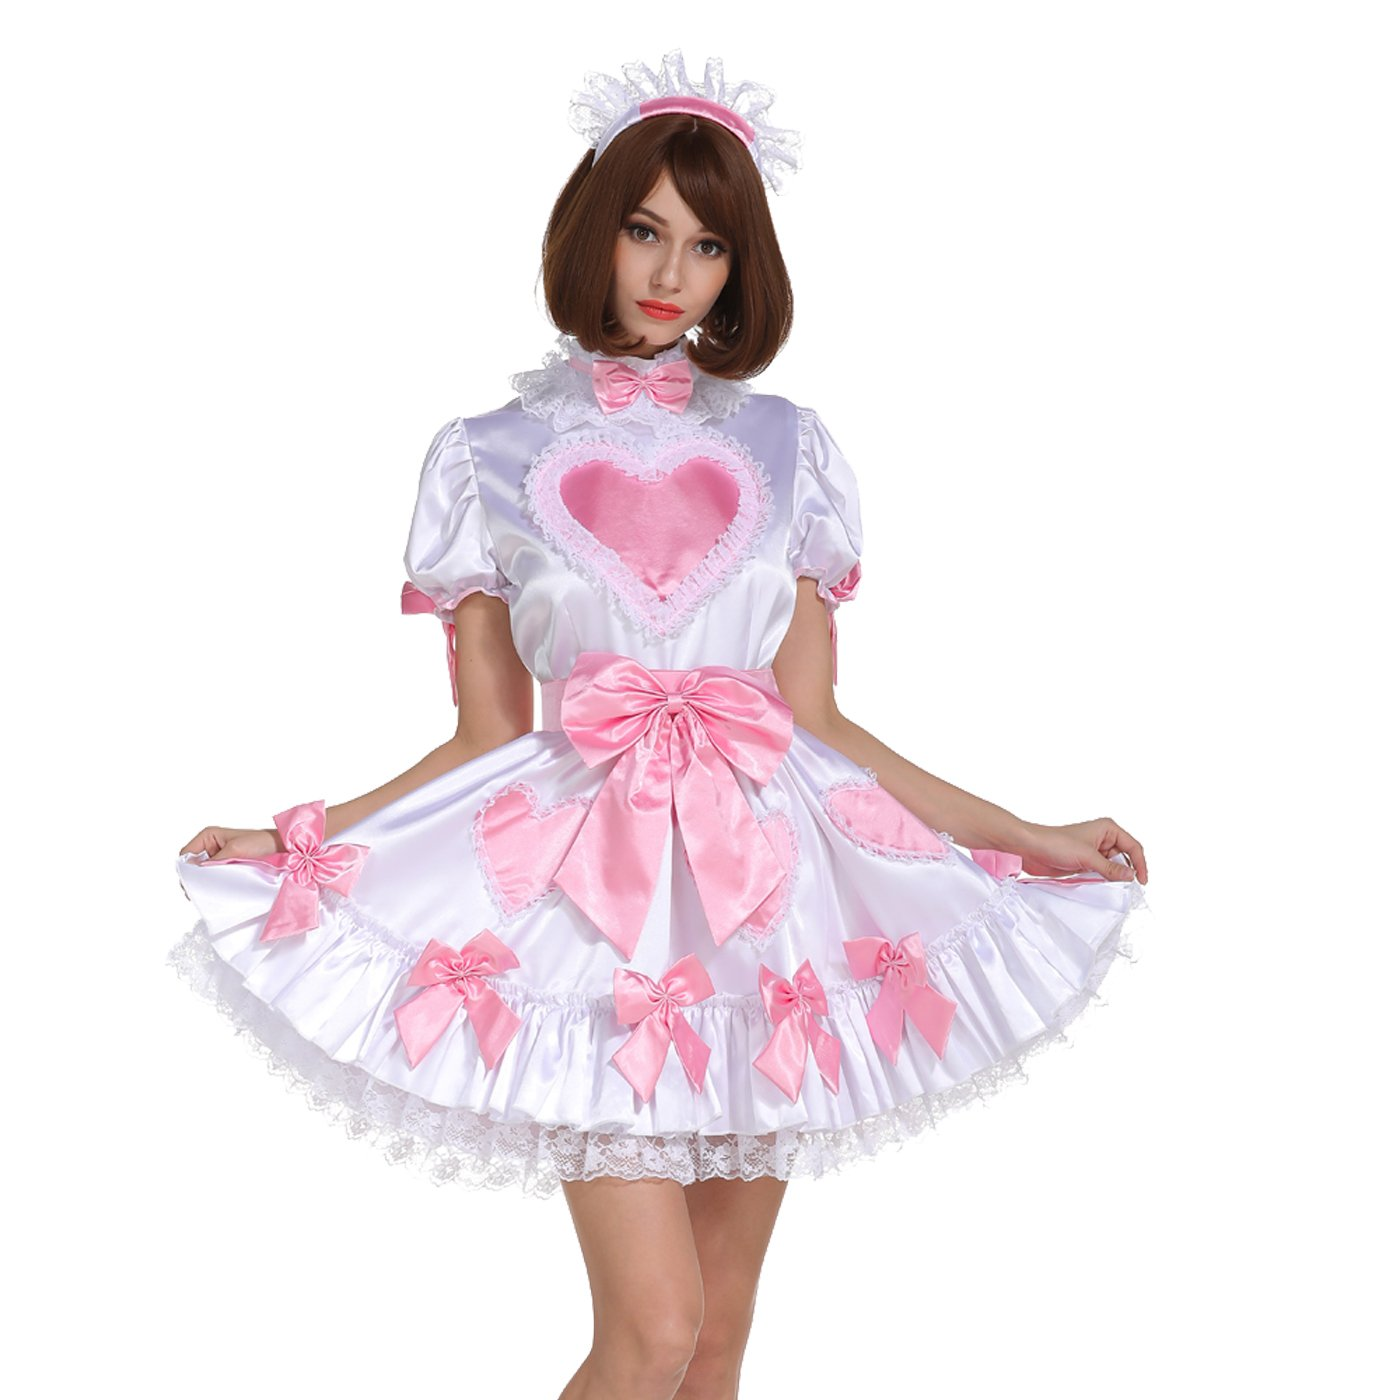 GOceBaby Sissy Maid Lockable Amazing Stain Heart Dream Dress Crossdressing (XXL) AB-01-169-4